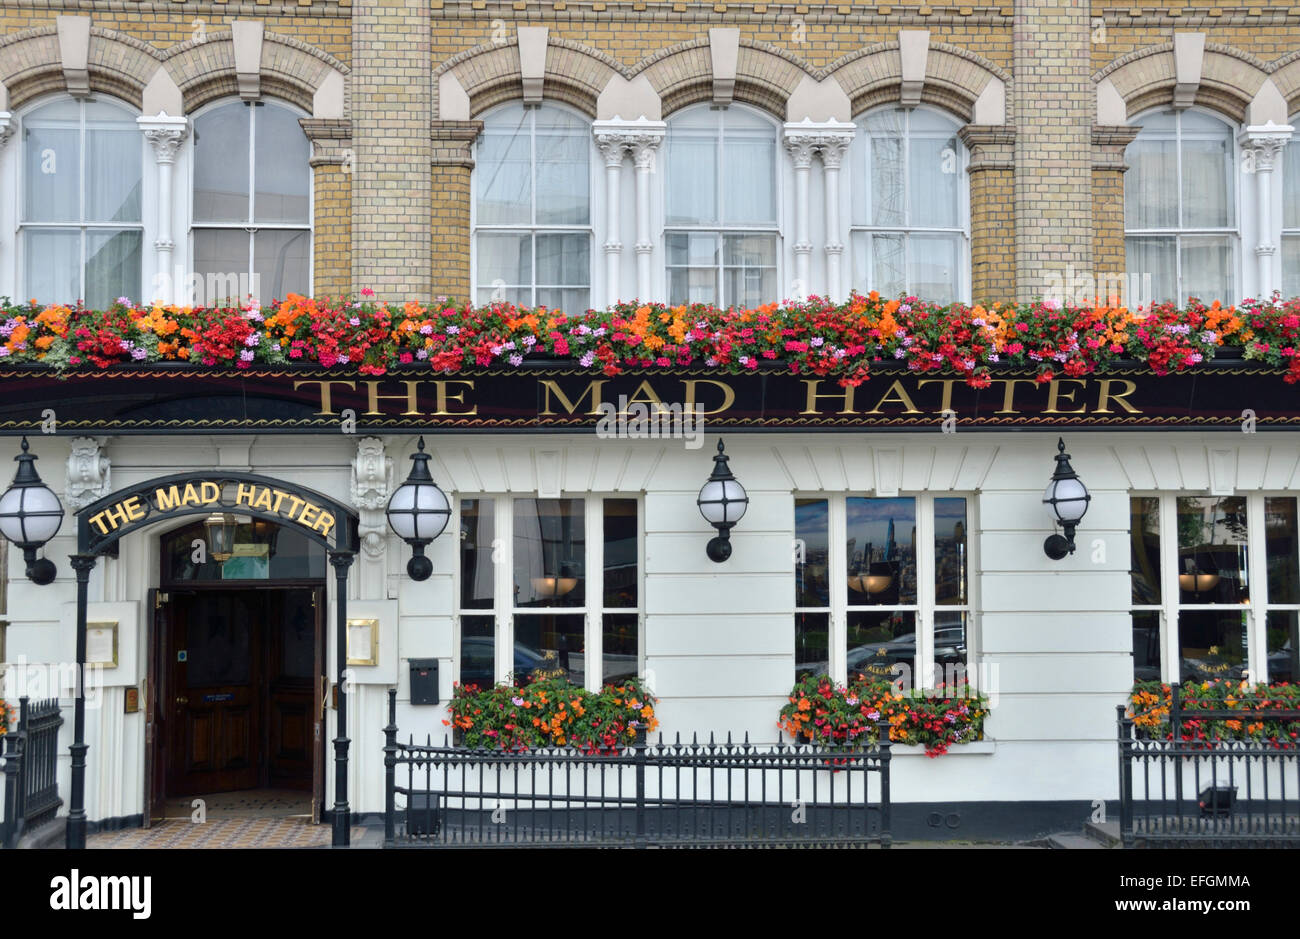 The Mad Hatter Hotel, Southwark, London, UK. - Stock Image